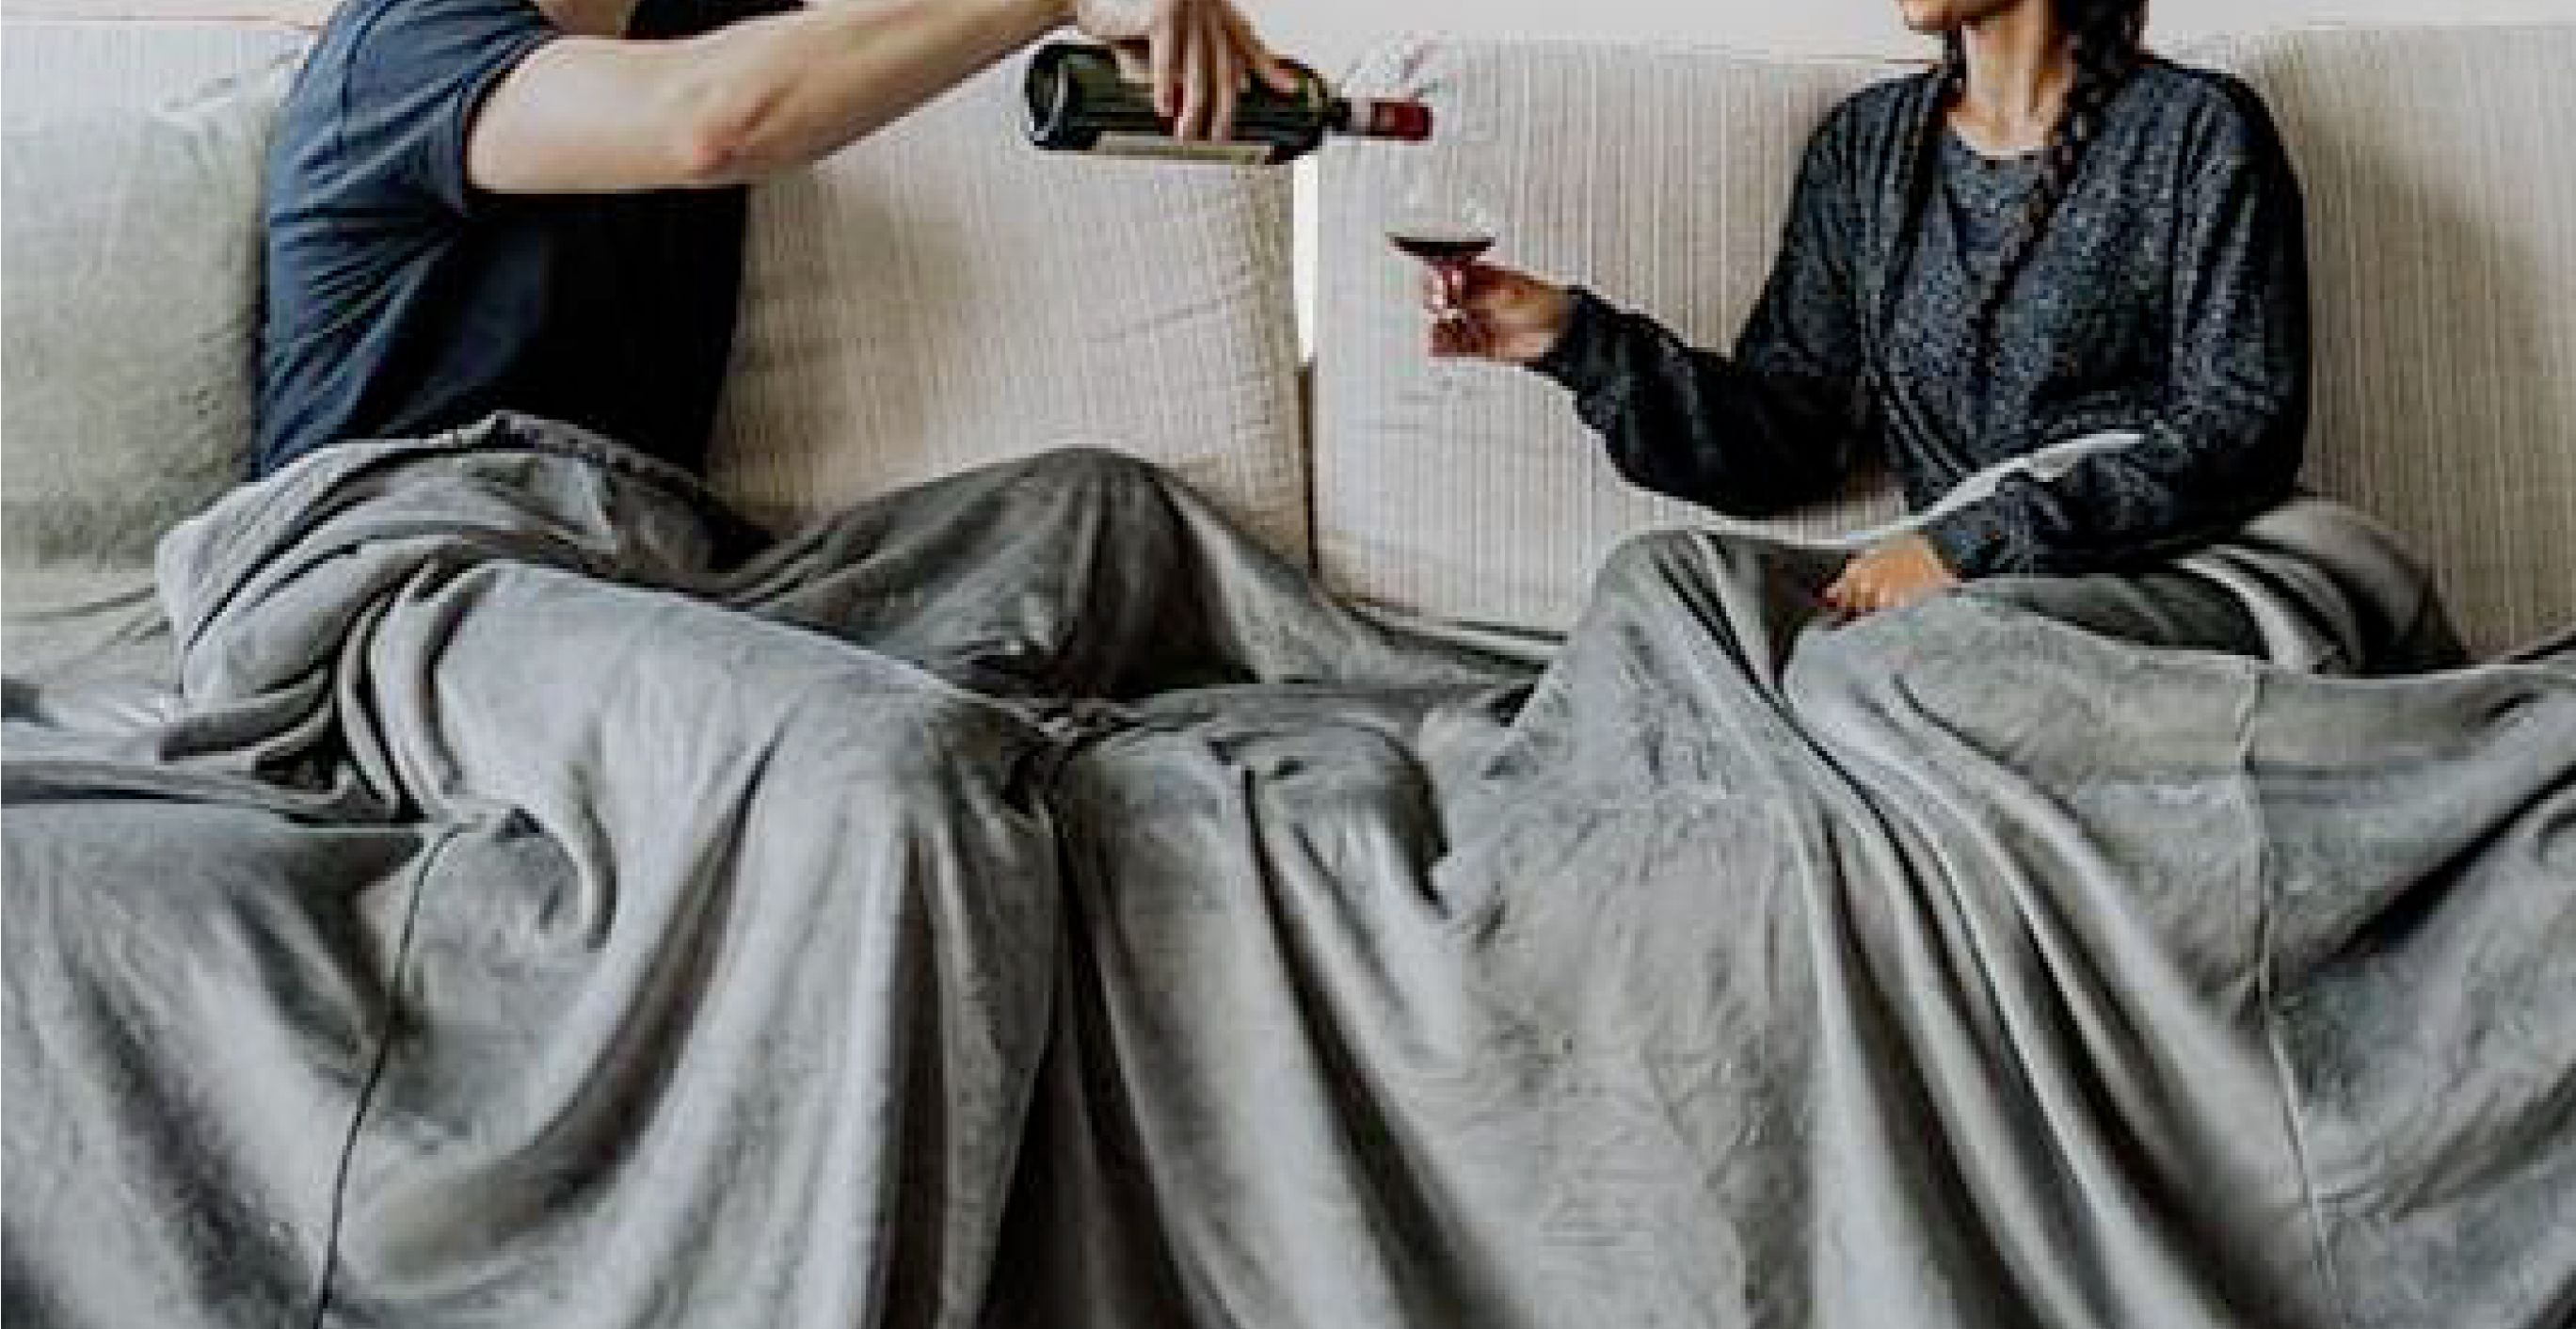 The Big Blanket